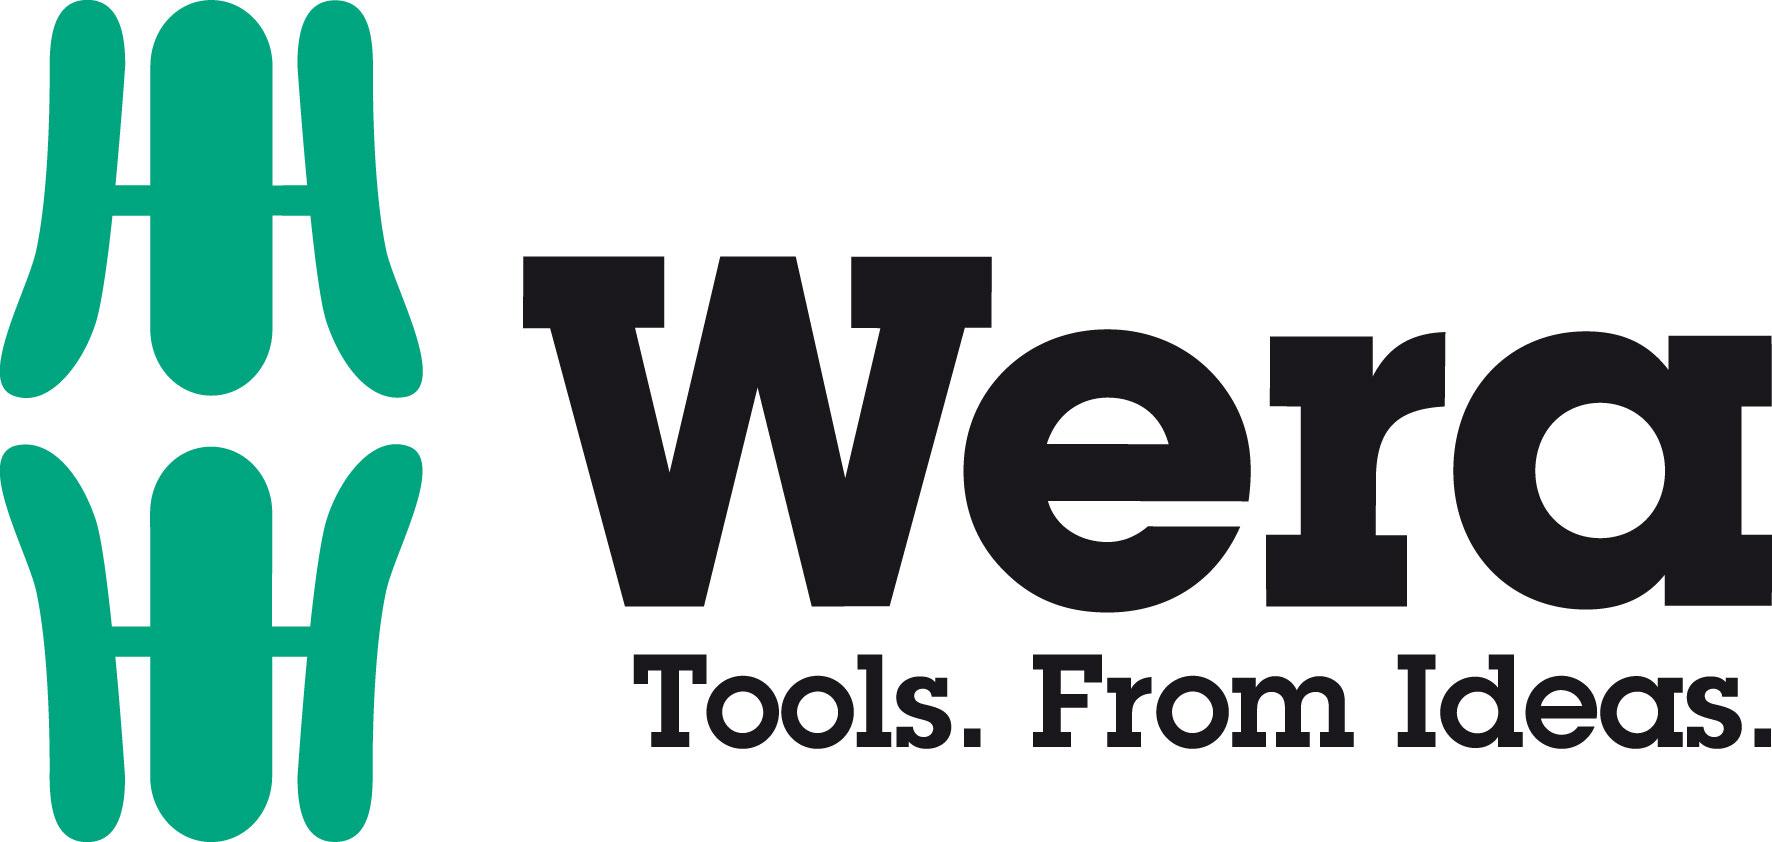 「wera logo」の画像検索結果